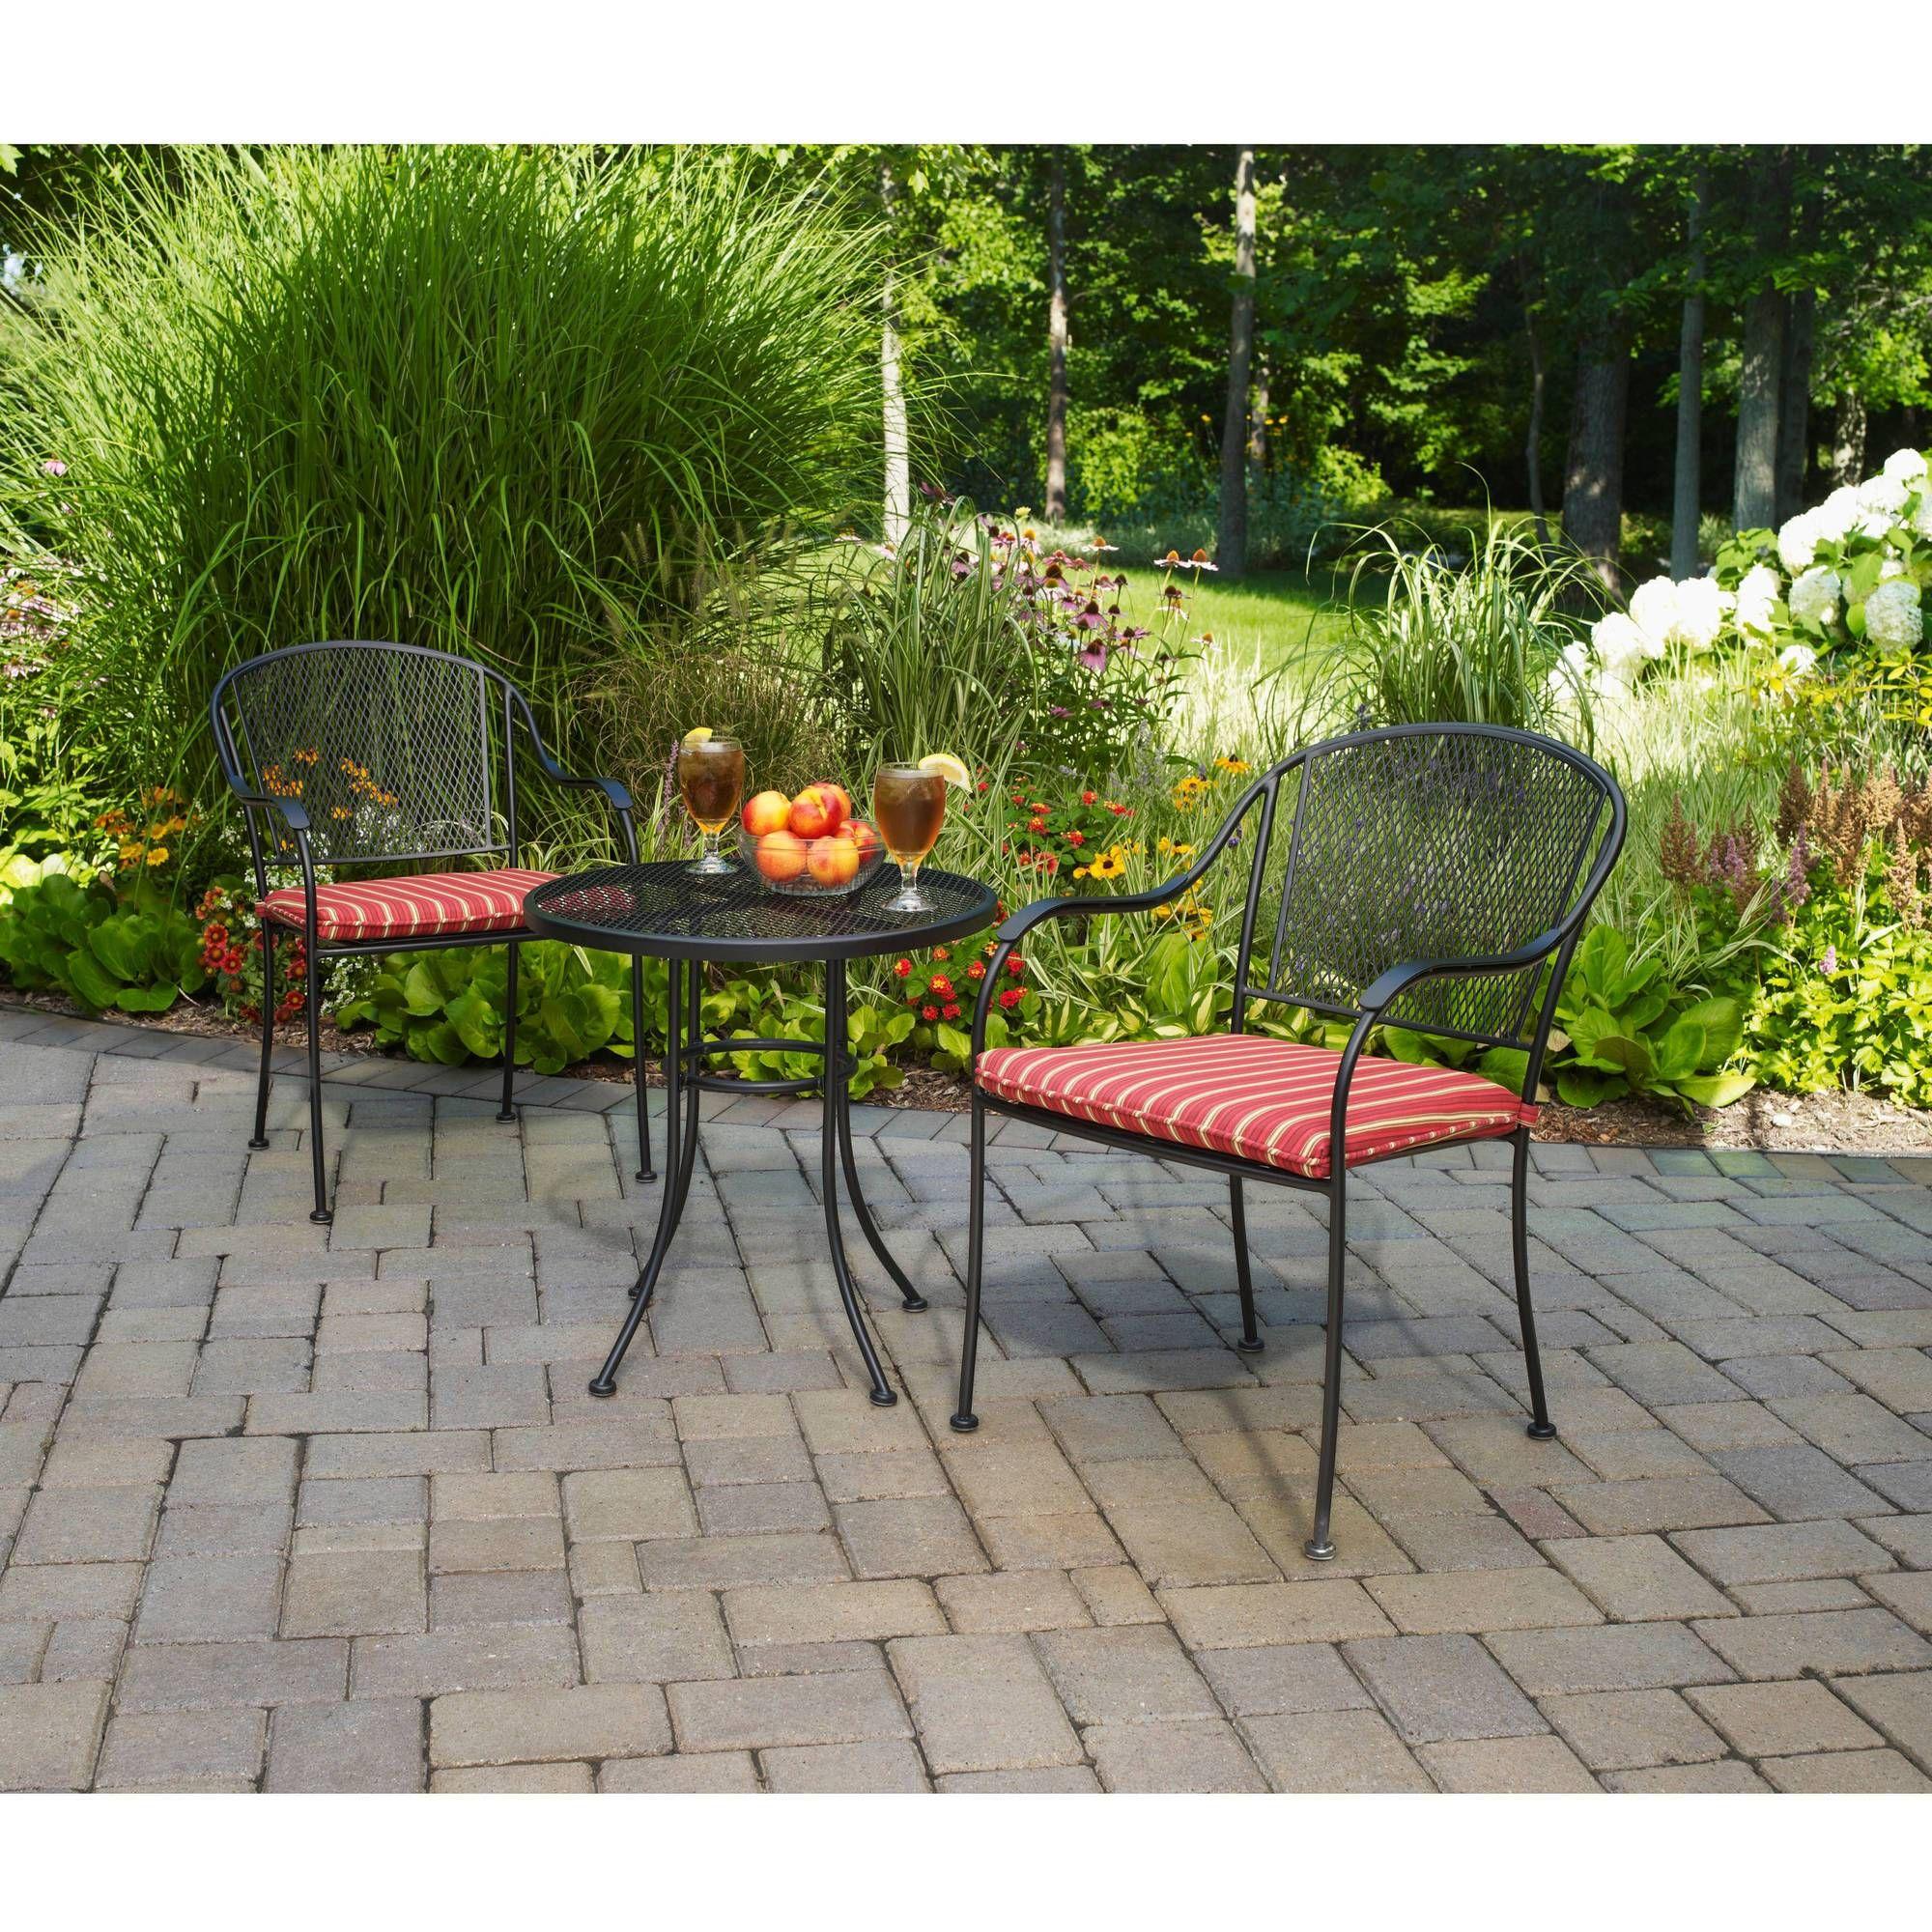 Black Wrought Iron Outdoor Furniture Pool Walmart Mainstays